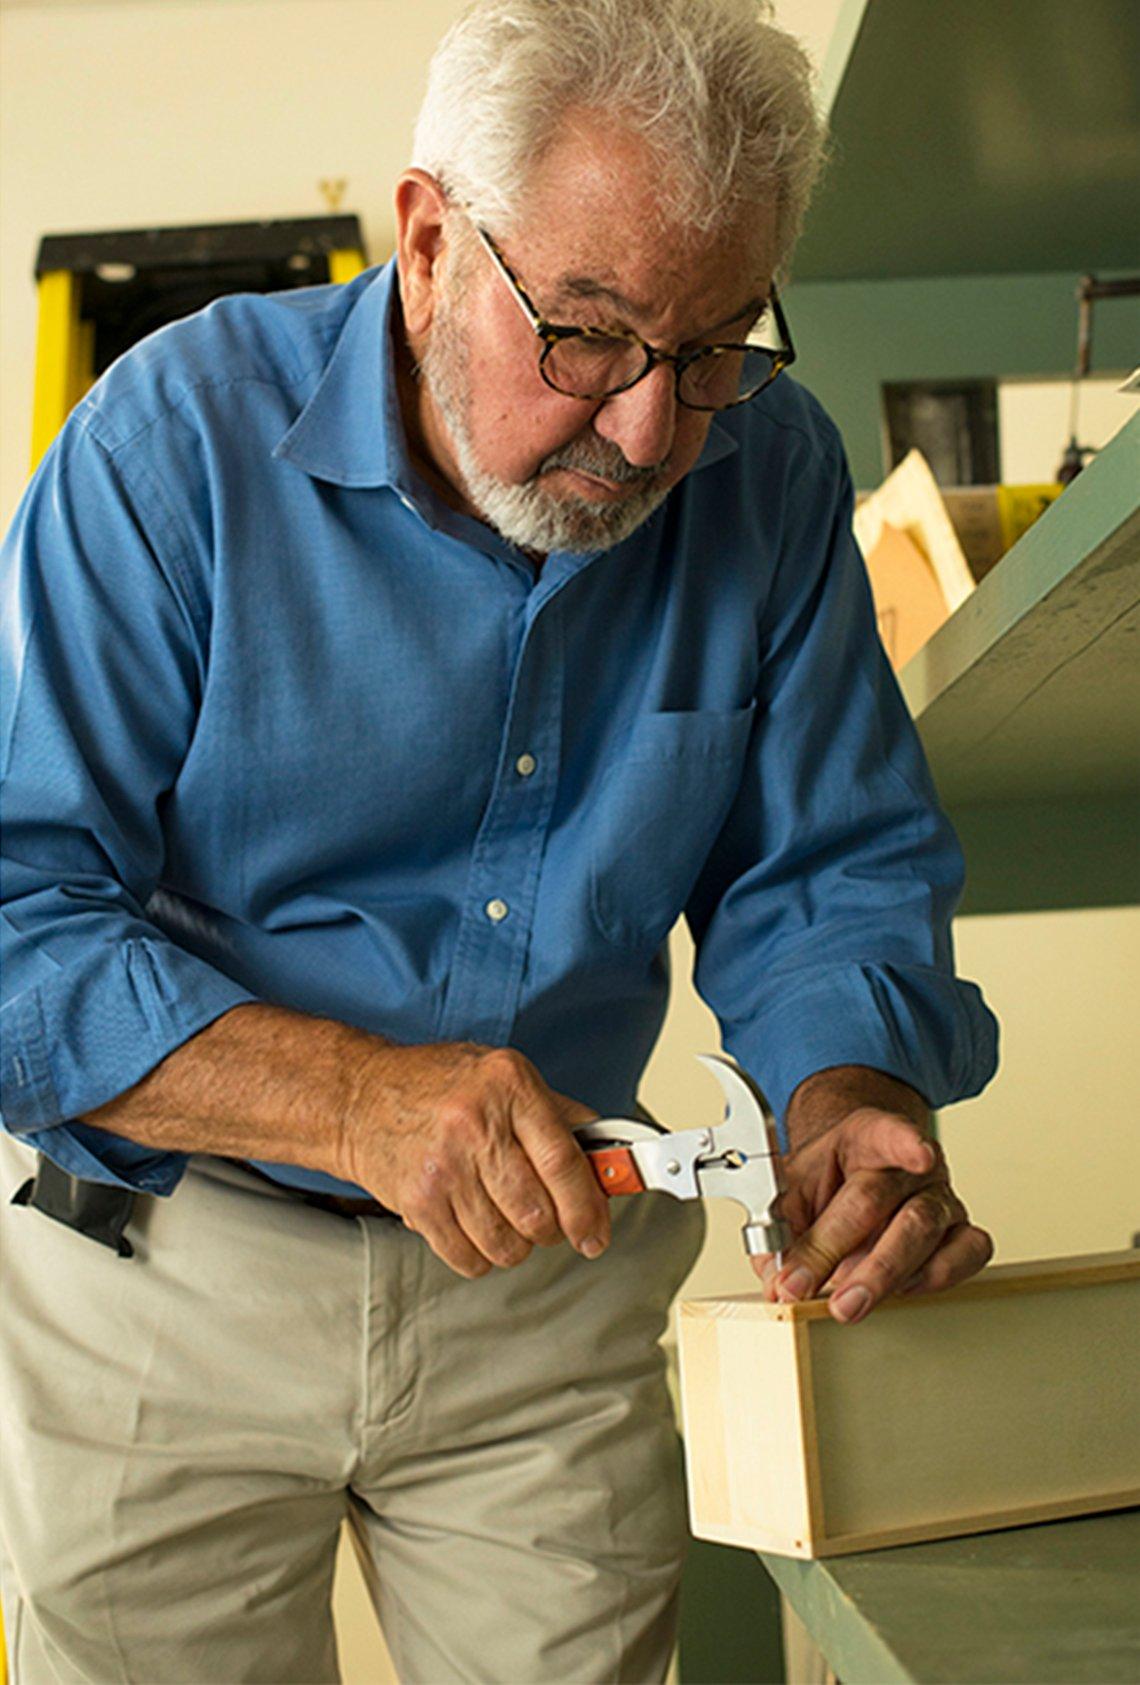 Bob Vila hammering a nail